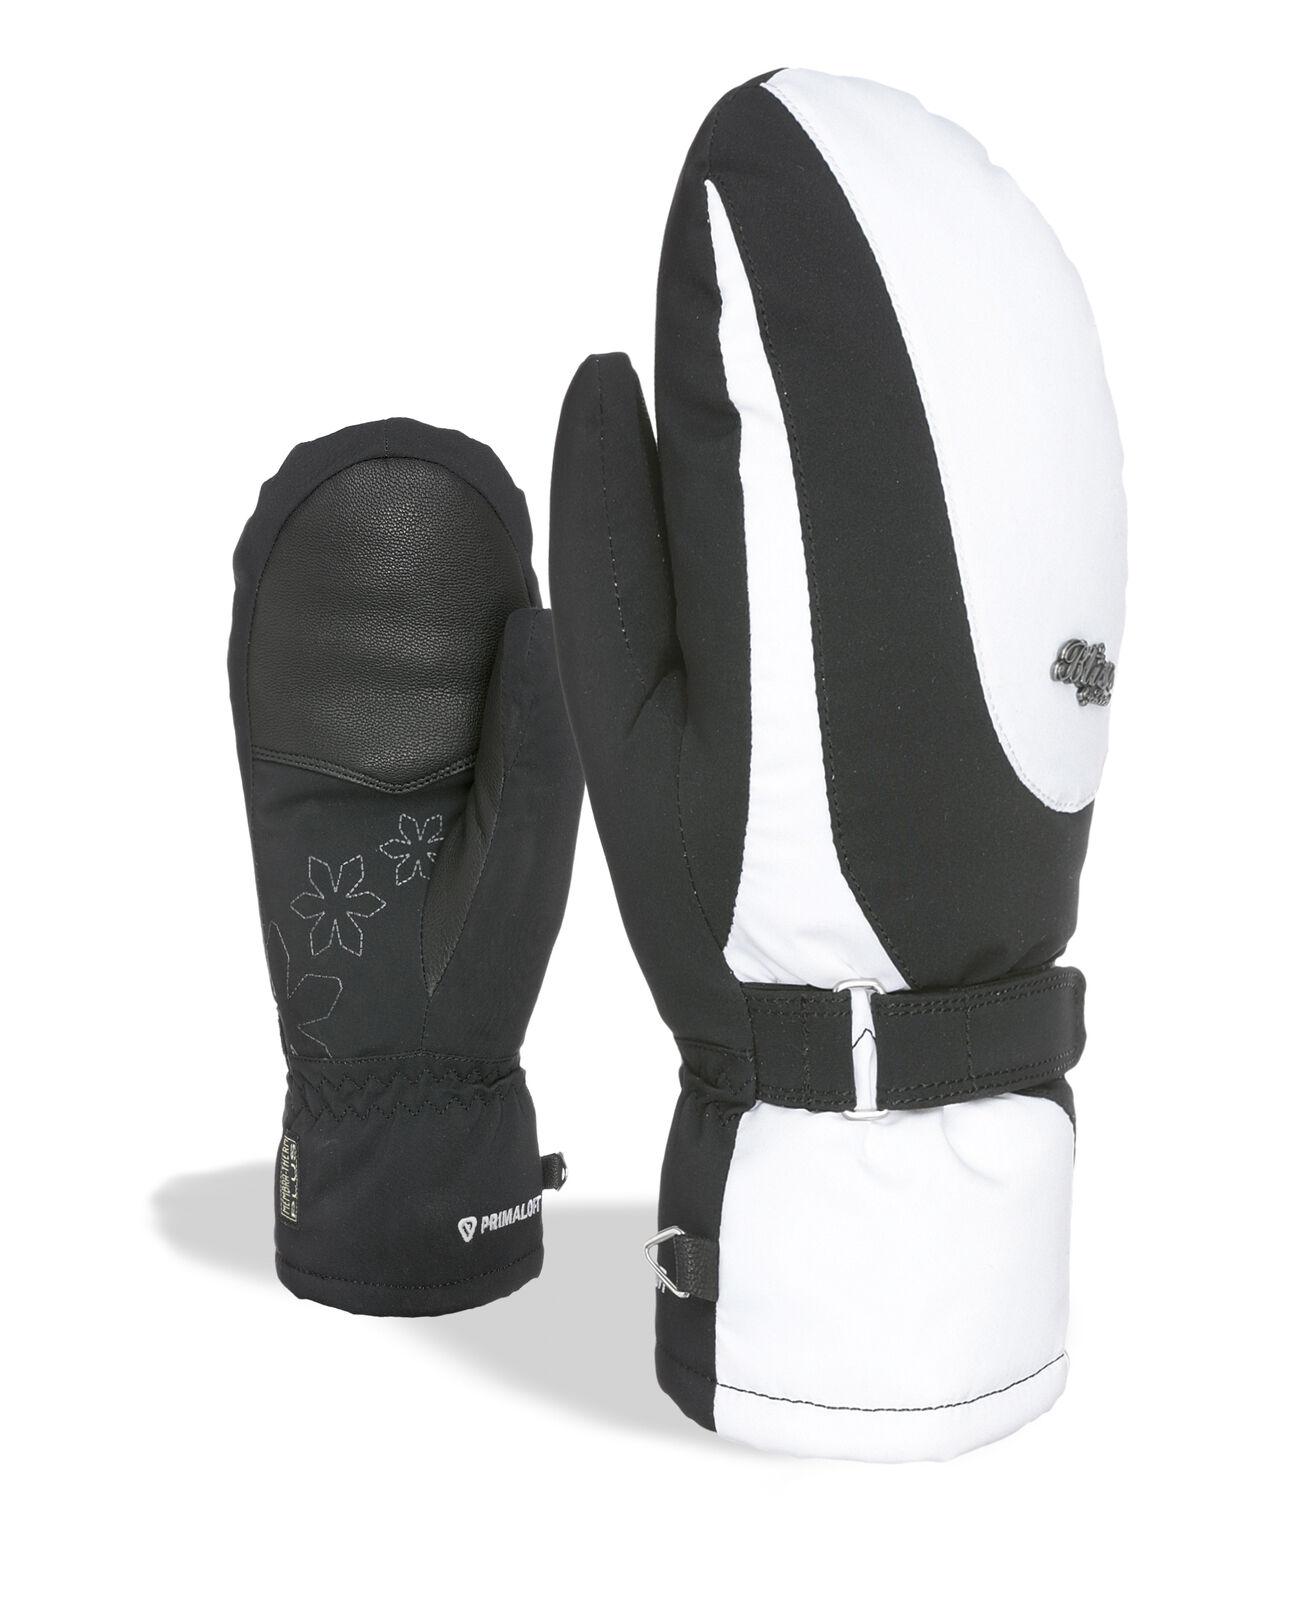 Level Handschuh Bliss Venus Mitt black wasserdicht atmungsaktiv